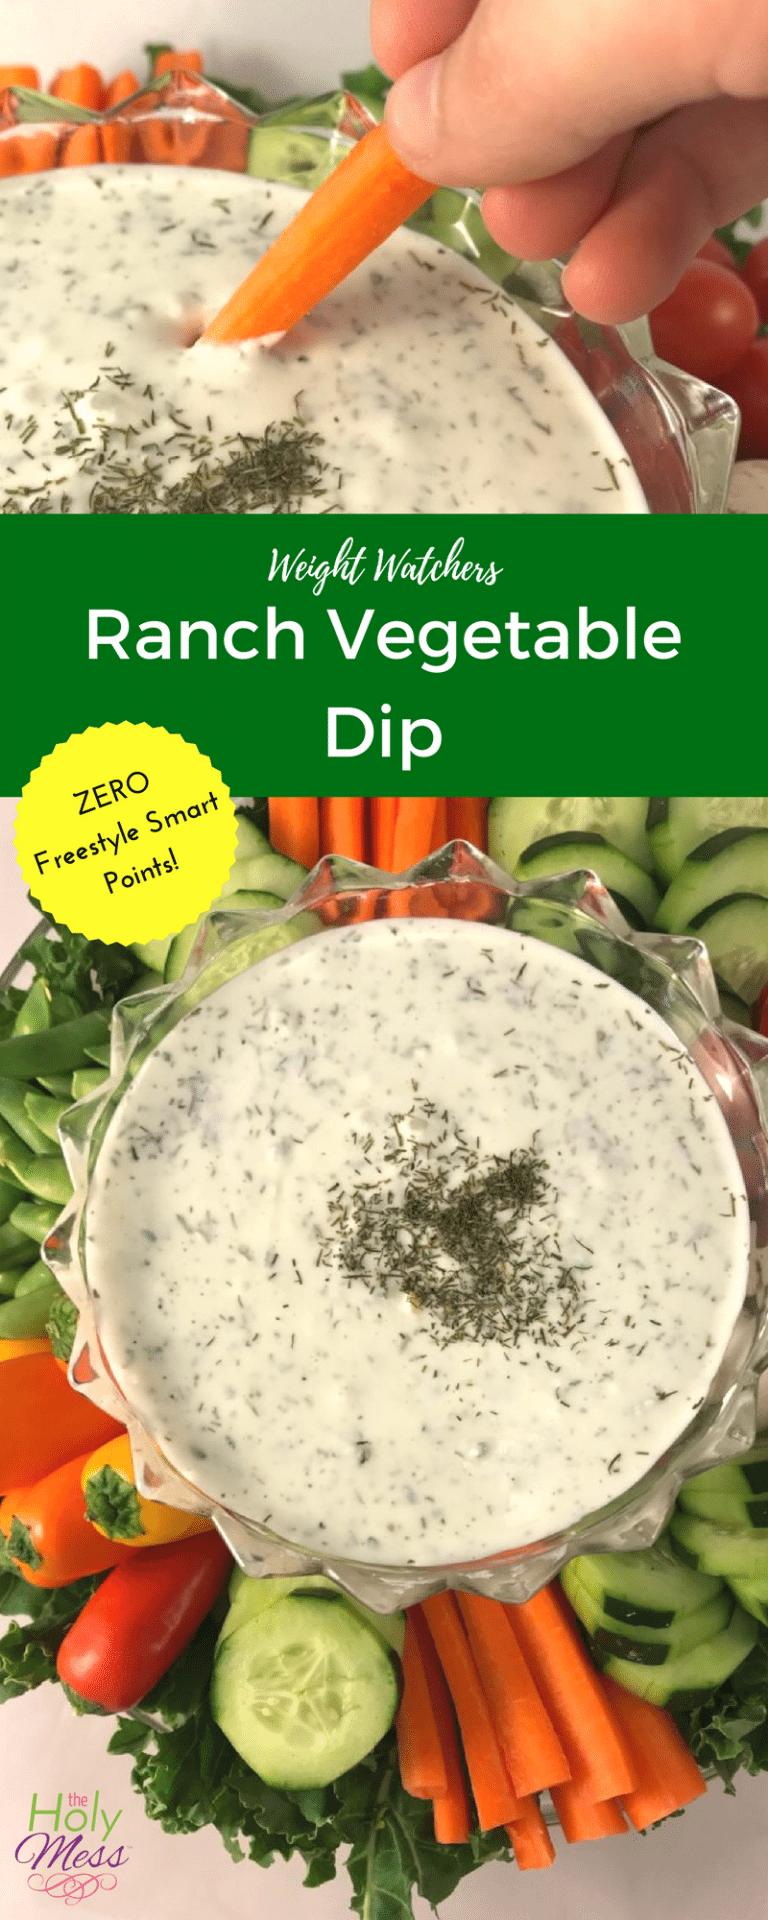 #vegetable #watchers #fitness #healthy #recipe #weight #ranch #diet #dipWeight Watchers Ranch Vegeta...